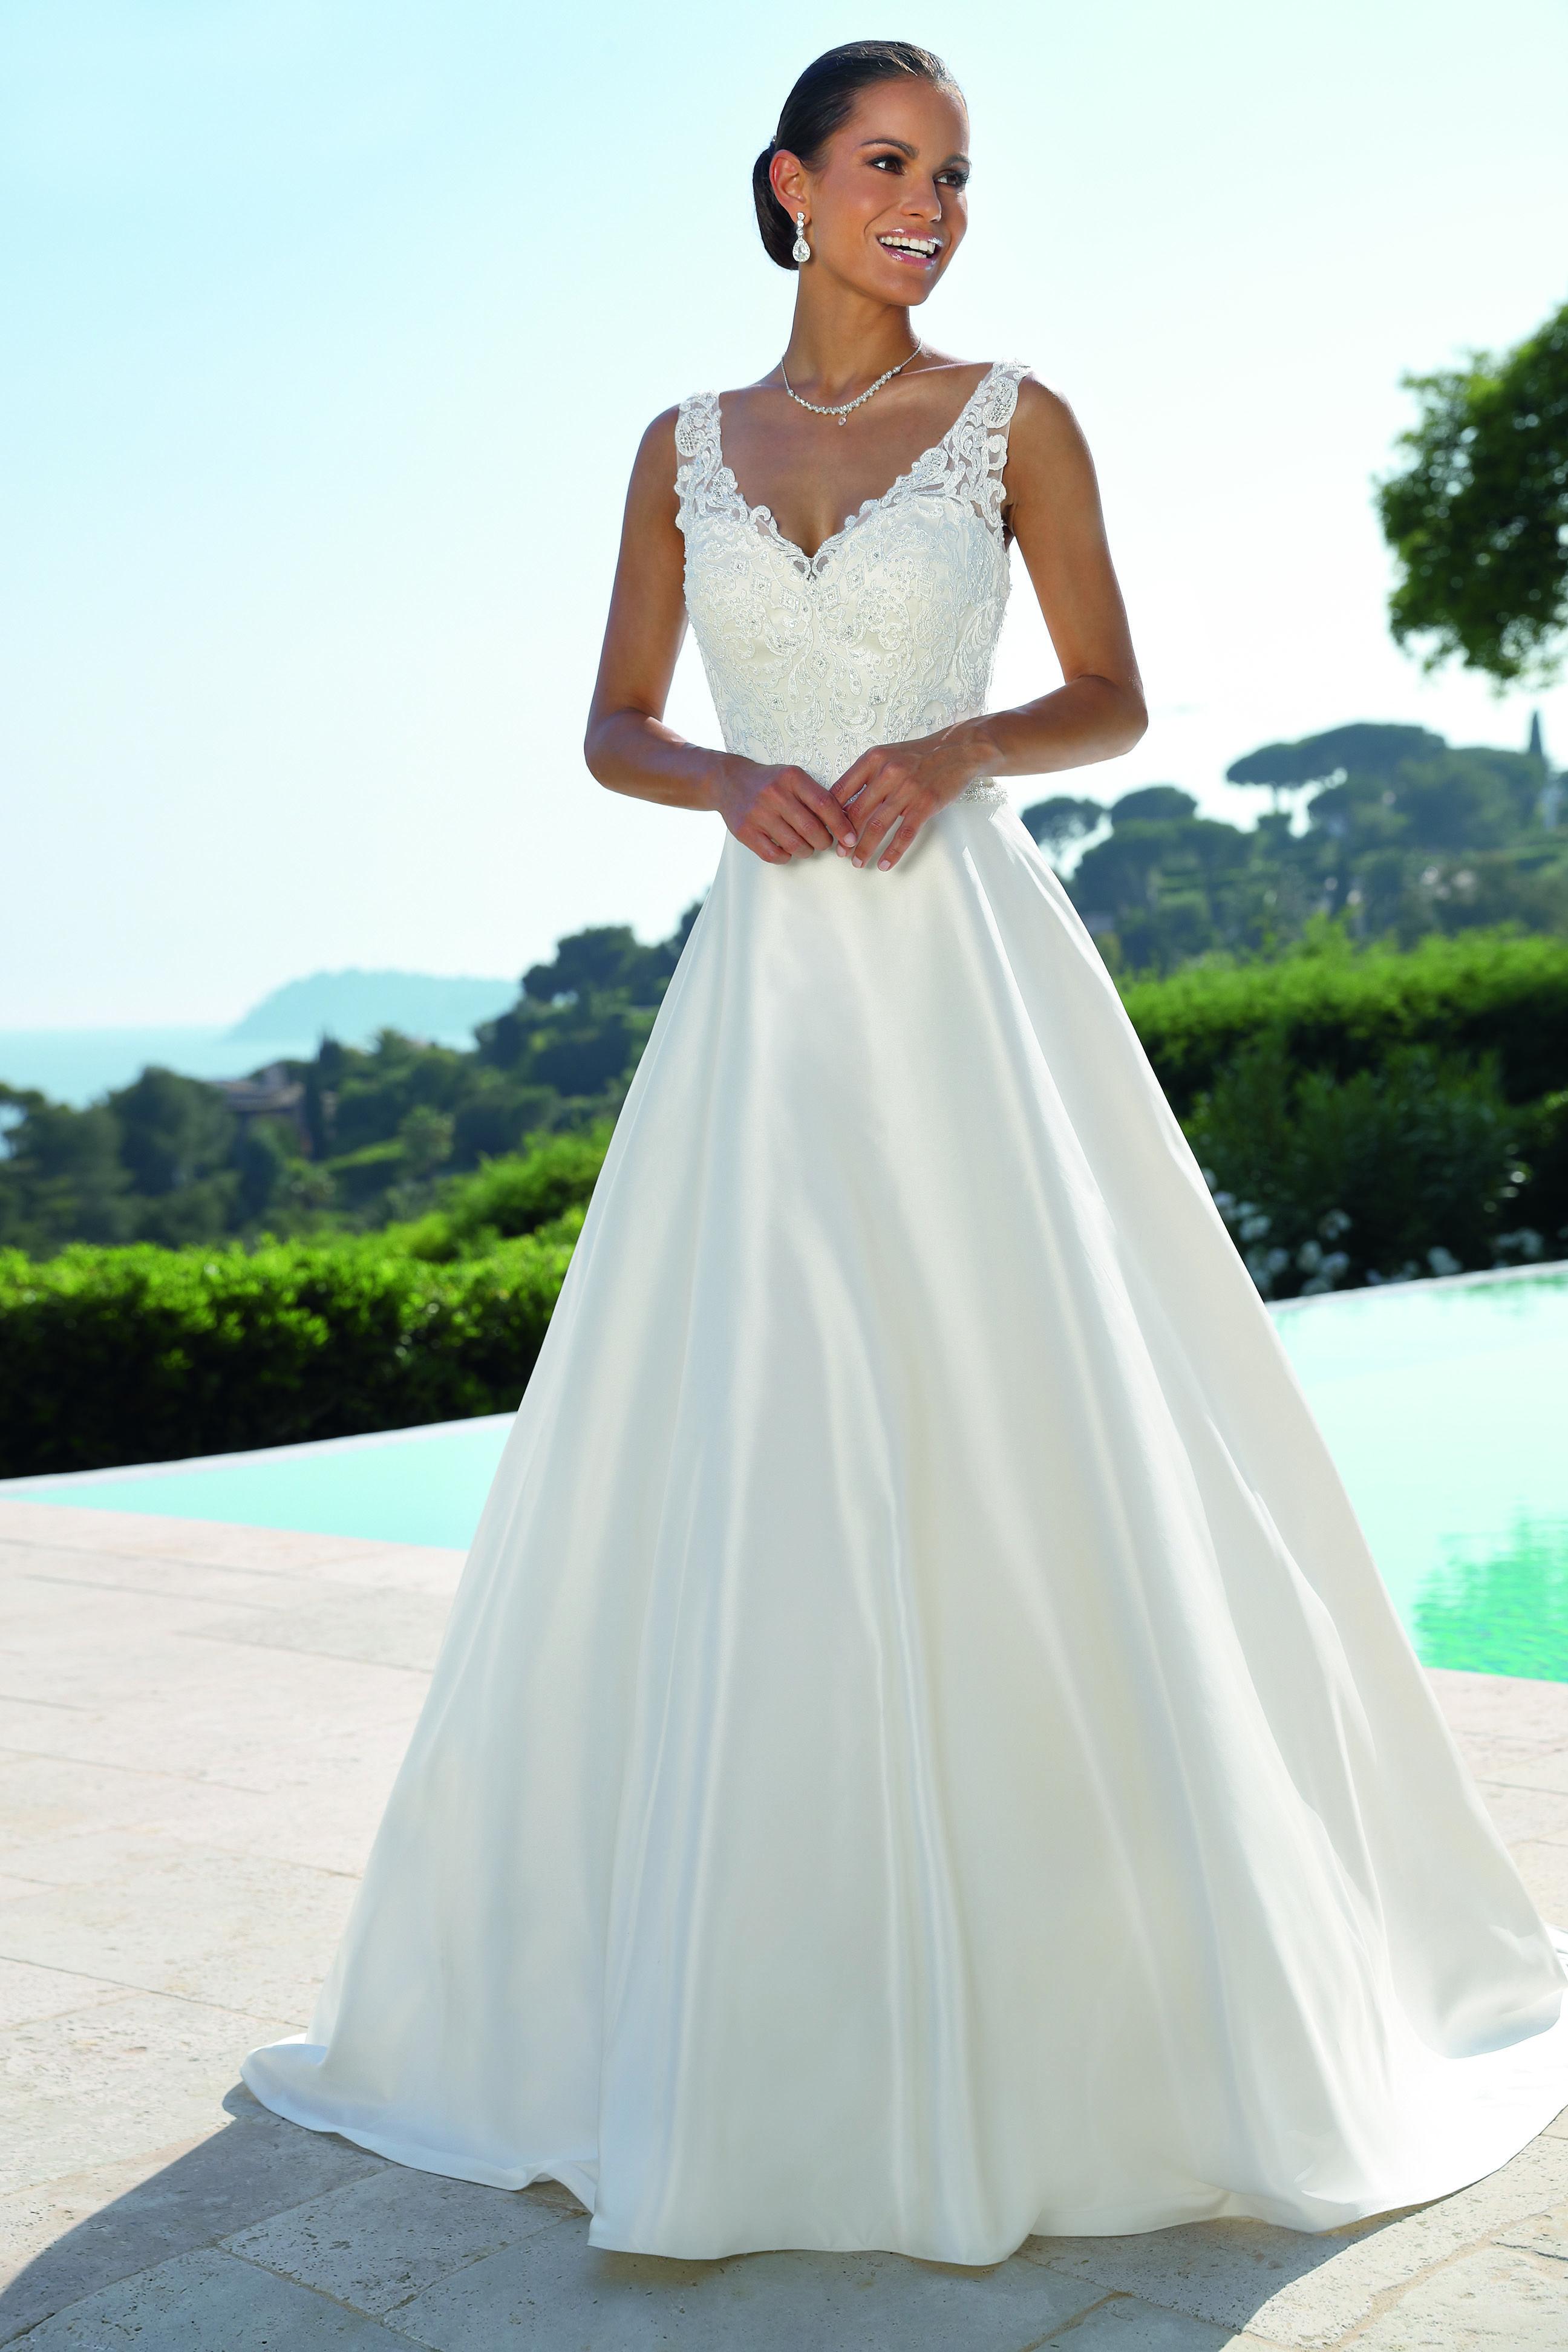 Ladybird 519052 Art 29095 Valkengoed Wedding Fashion